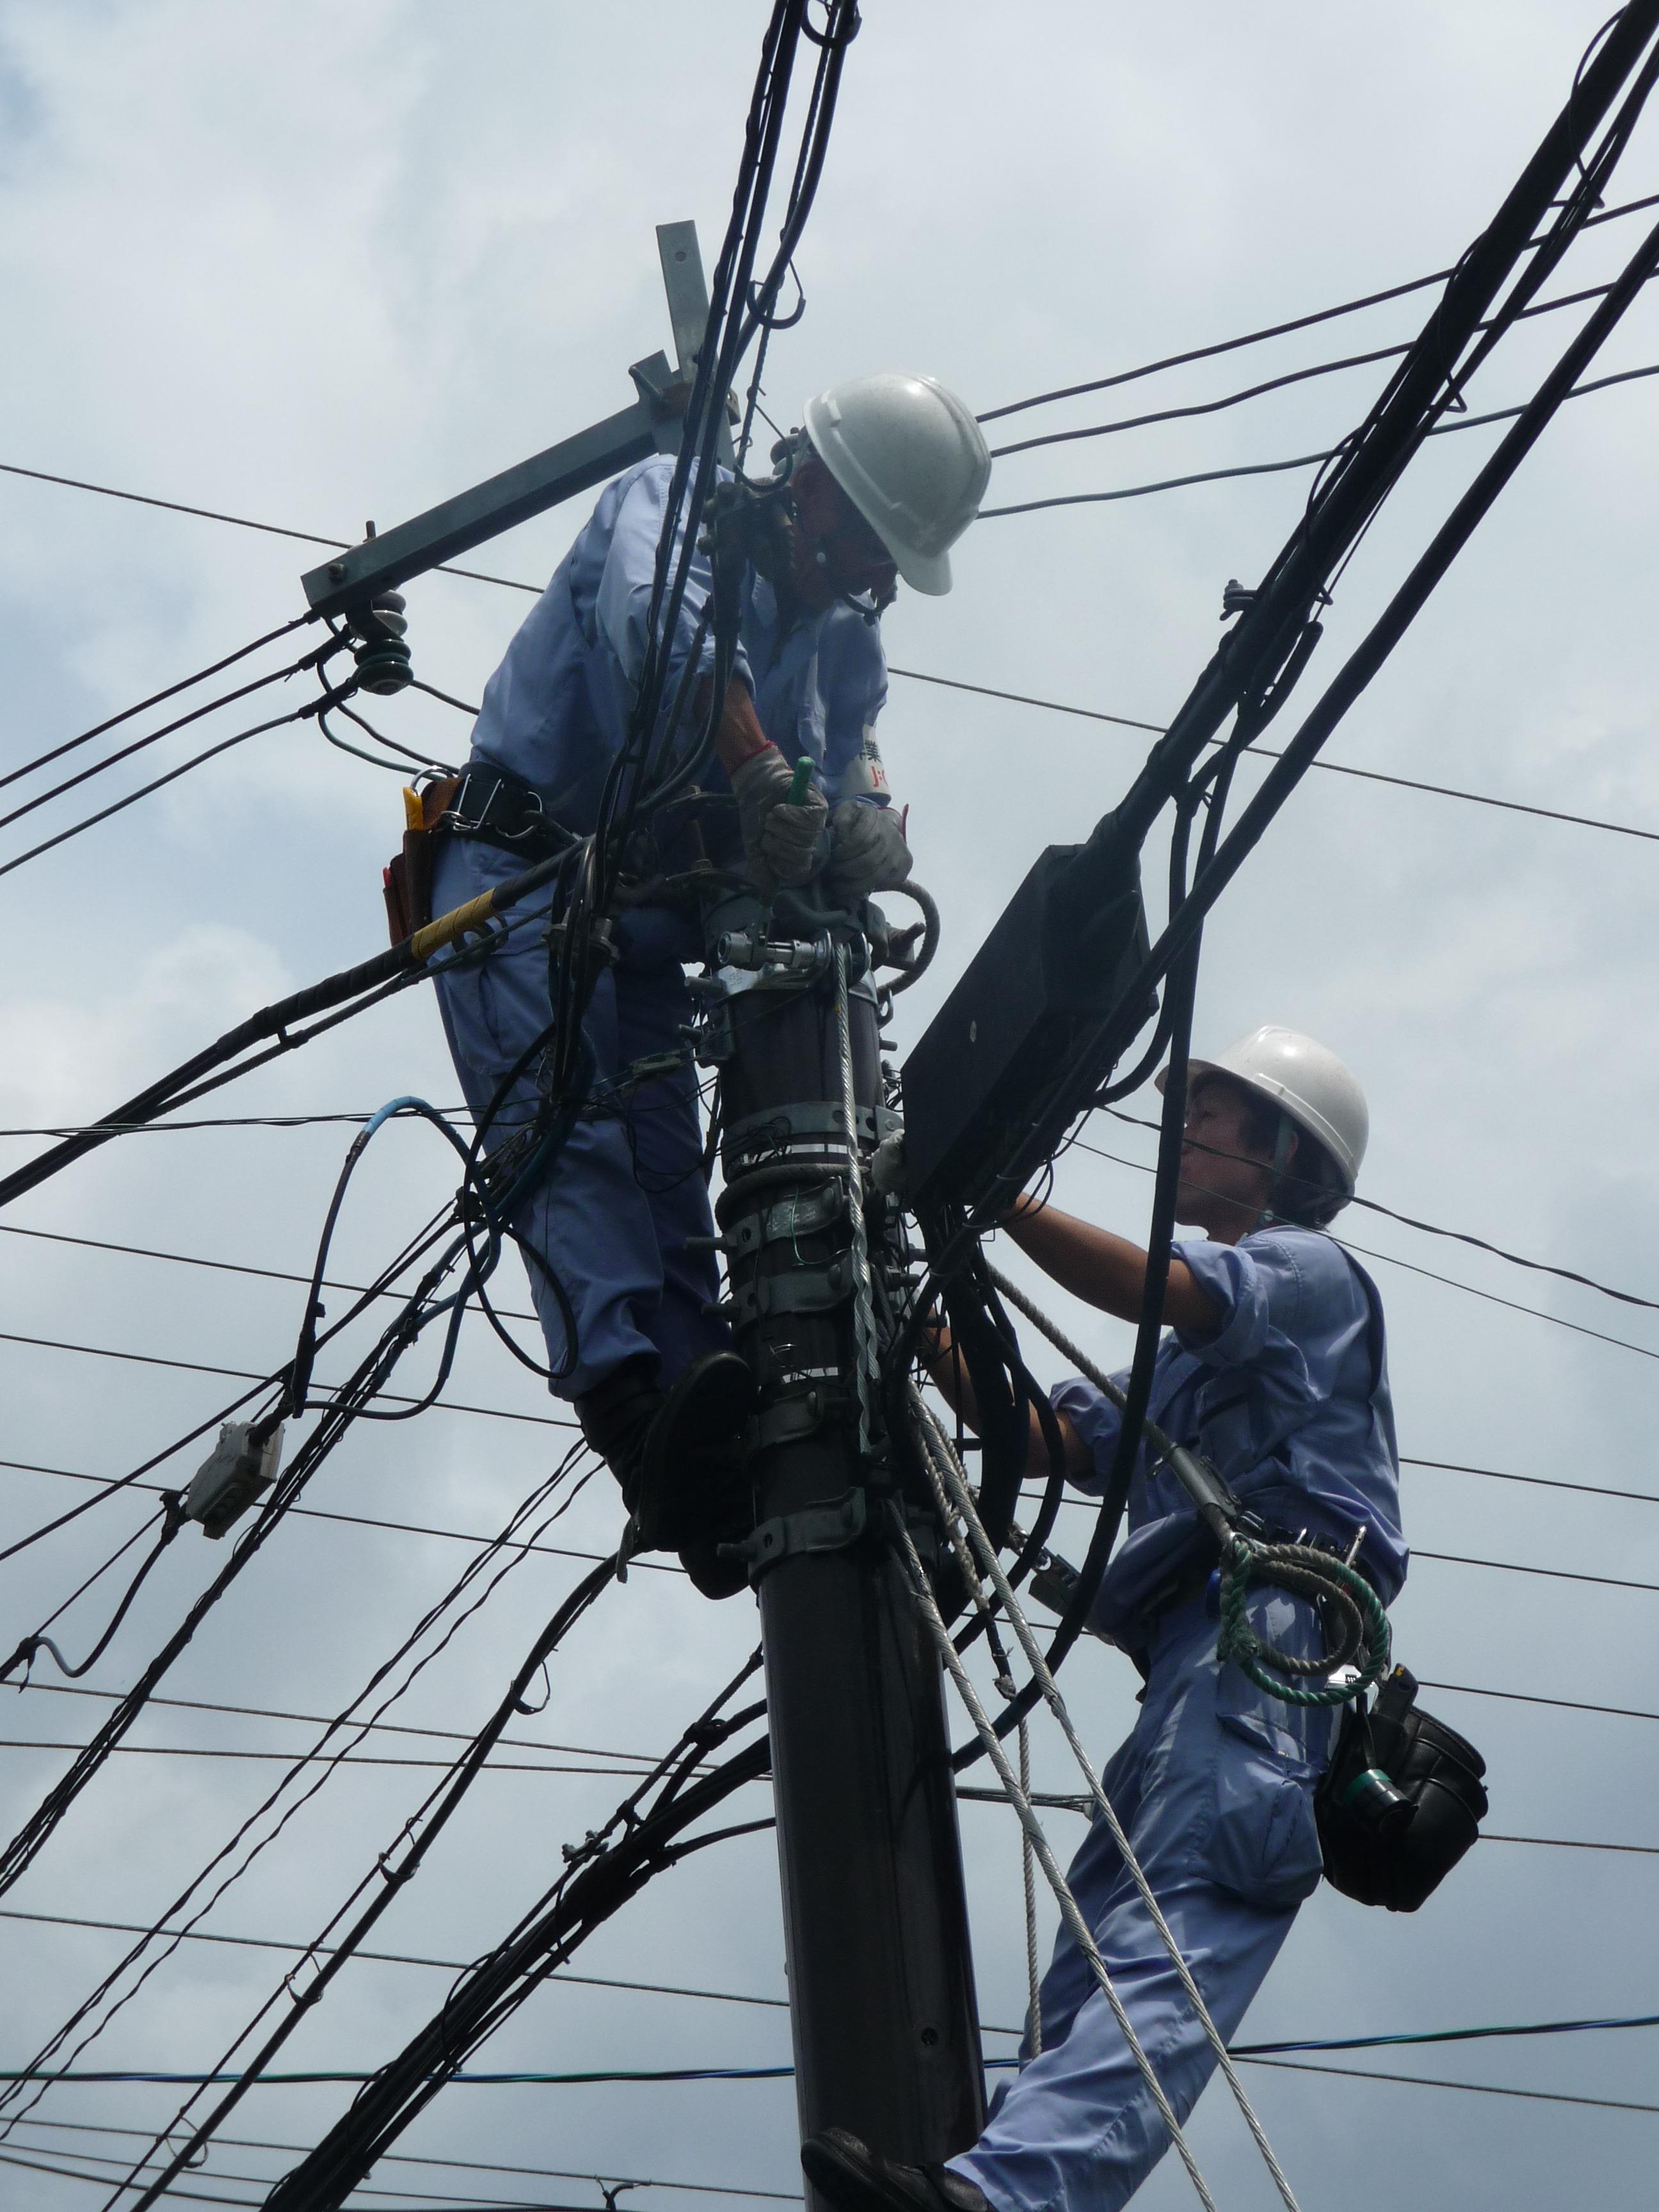 Bildet reparere kj ret y mast elektrisitet linjer - Cables de electricidad ...